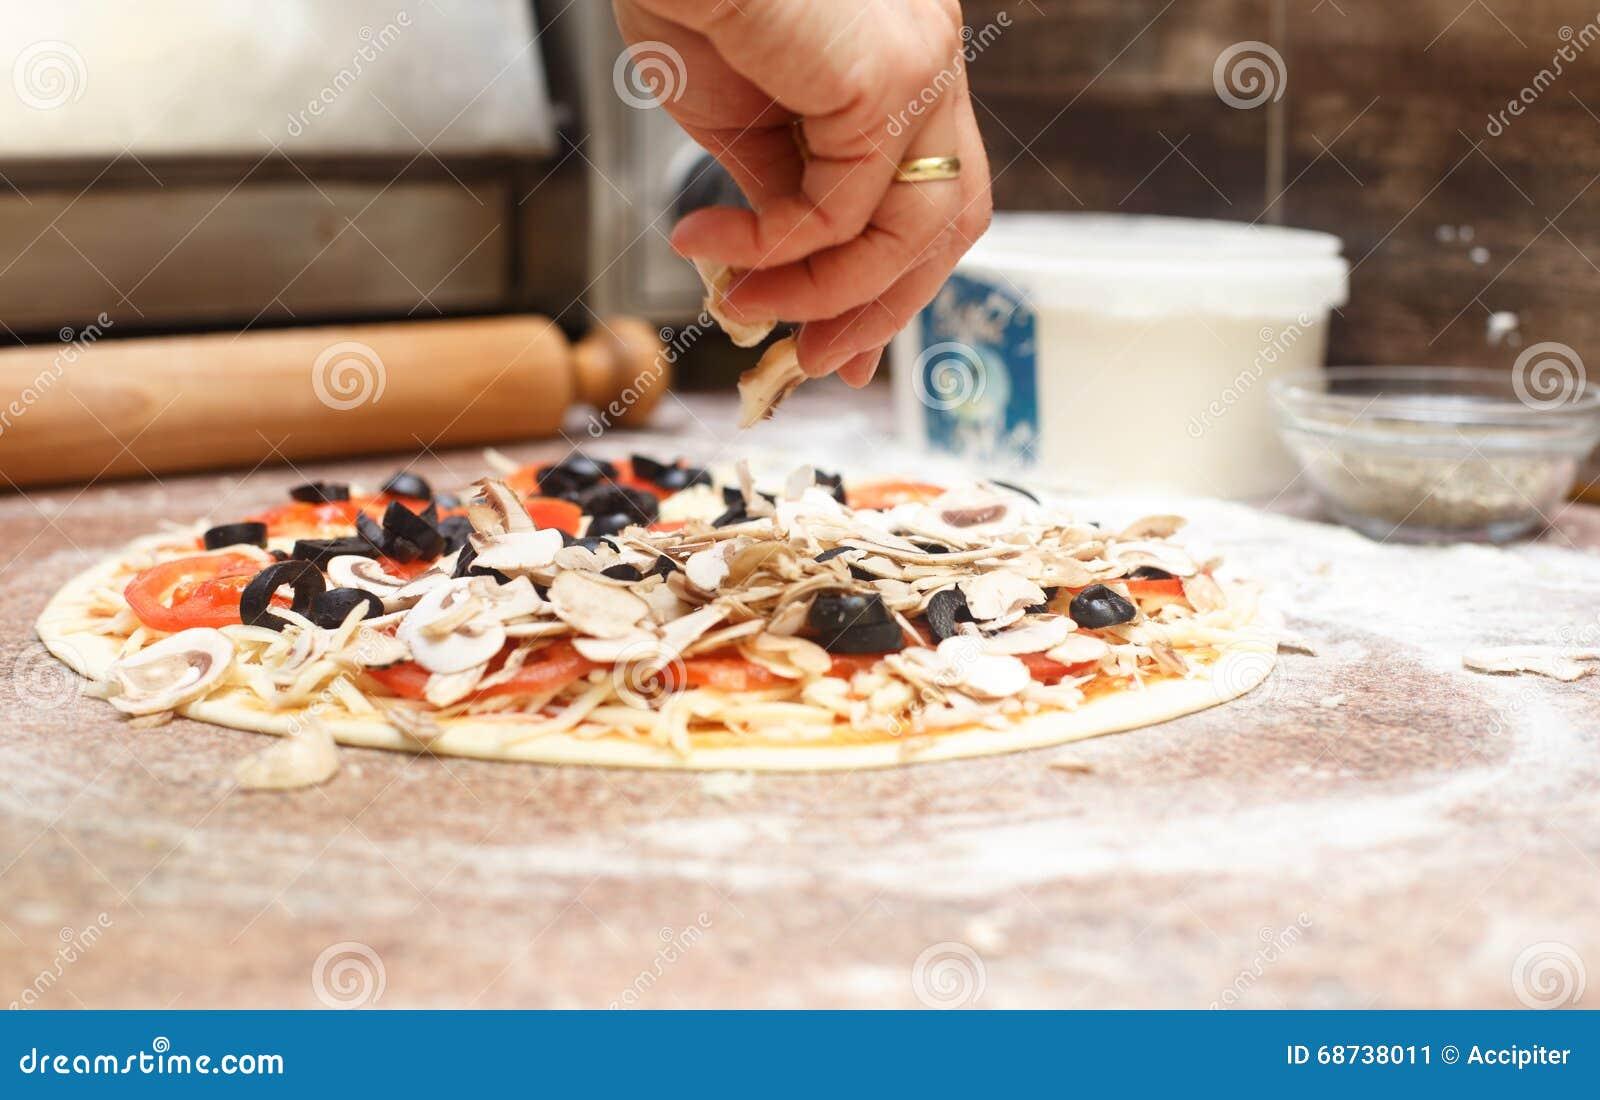 Making vegetarian pizza